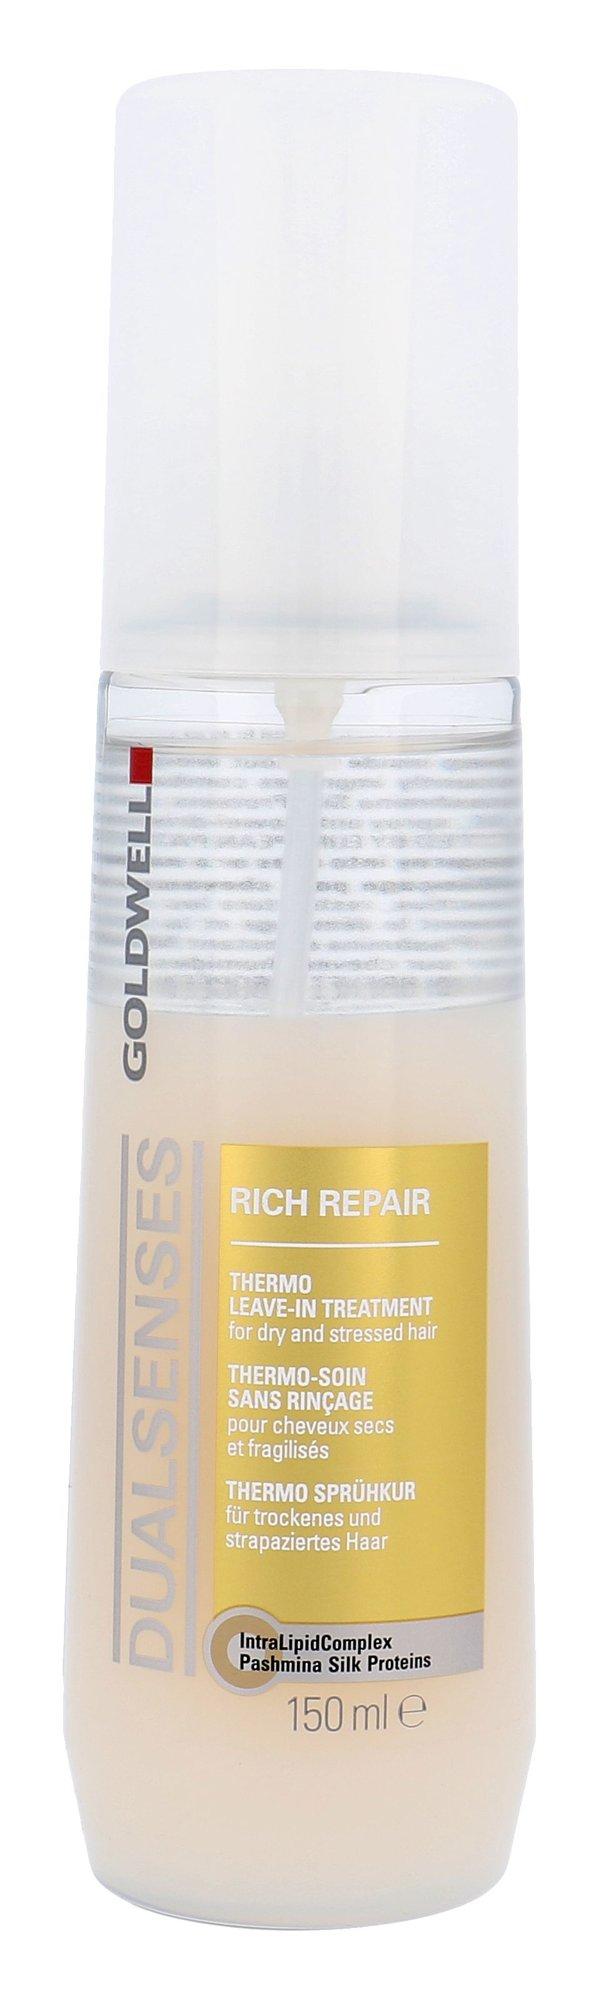 Goldwell Dualsenses Rich Repair Cosmetic 150ml